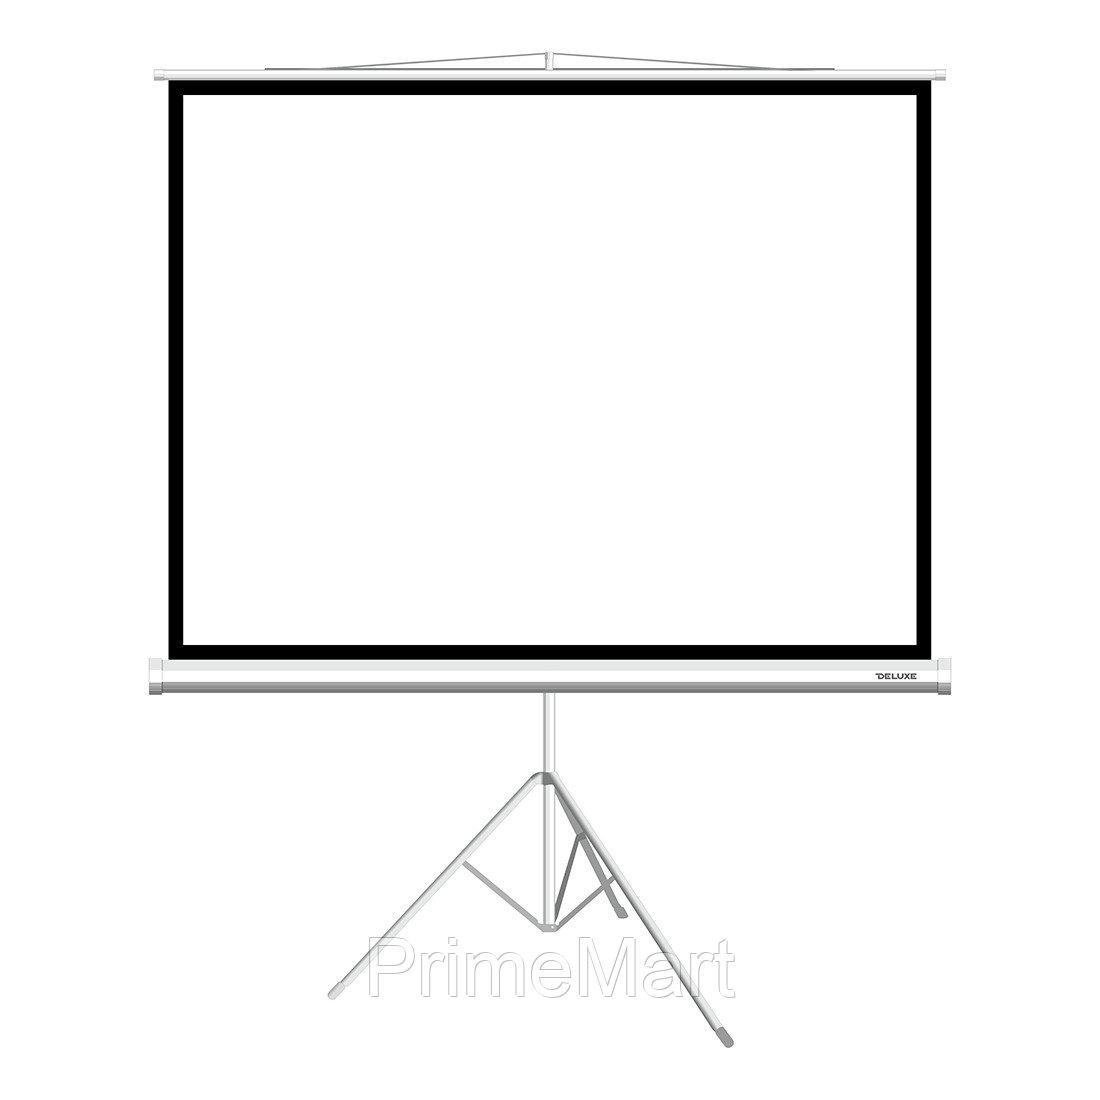 Экран на треноге, Deluxe, DLS-T244x183W, Рабочая поверхность 232х174 см., 1:1, Matt white, Белый